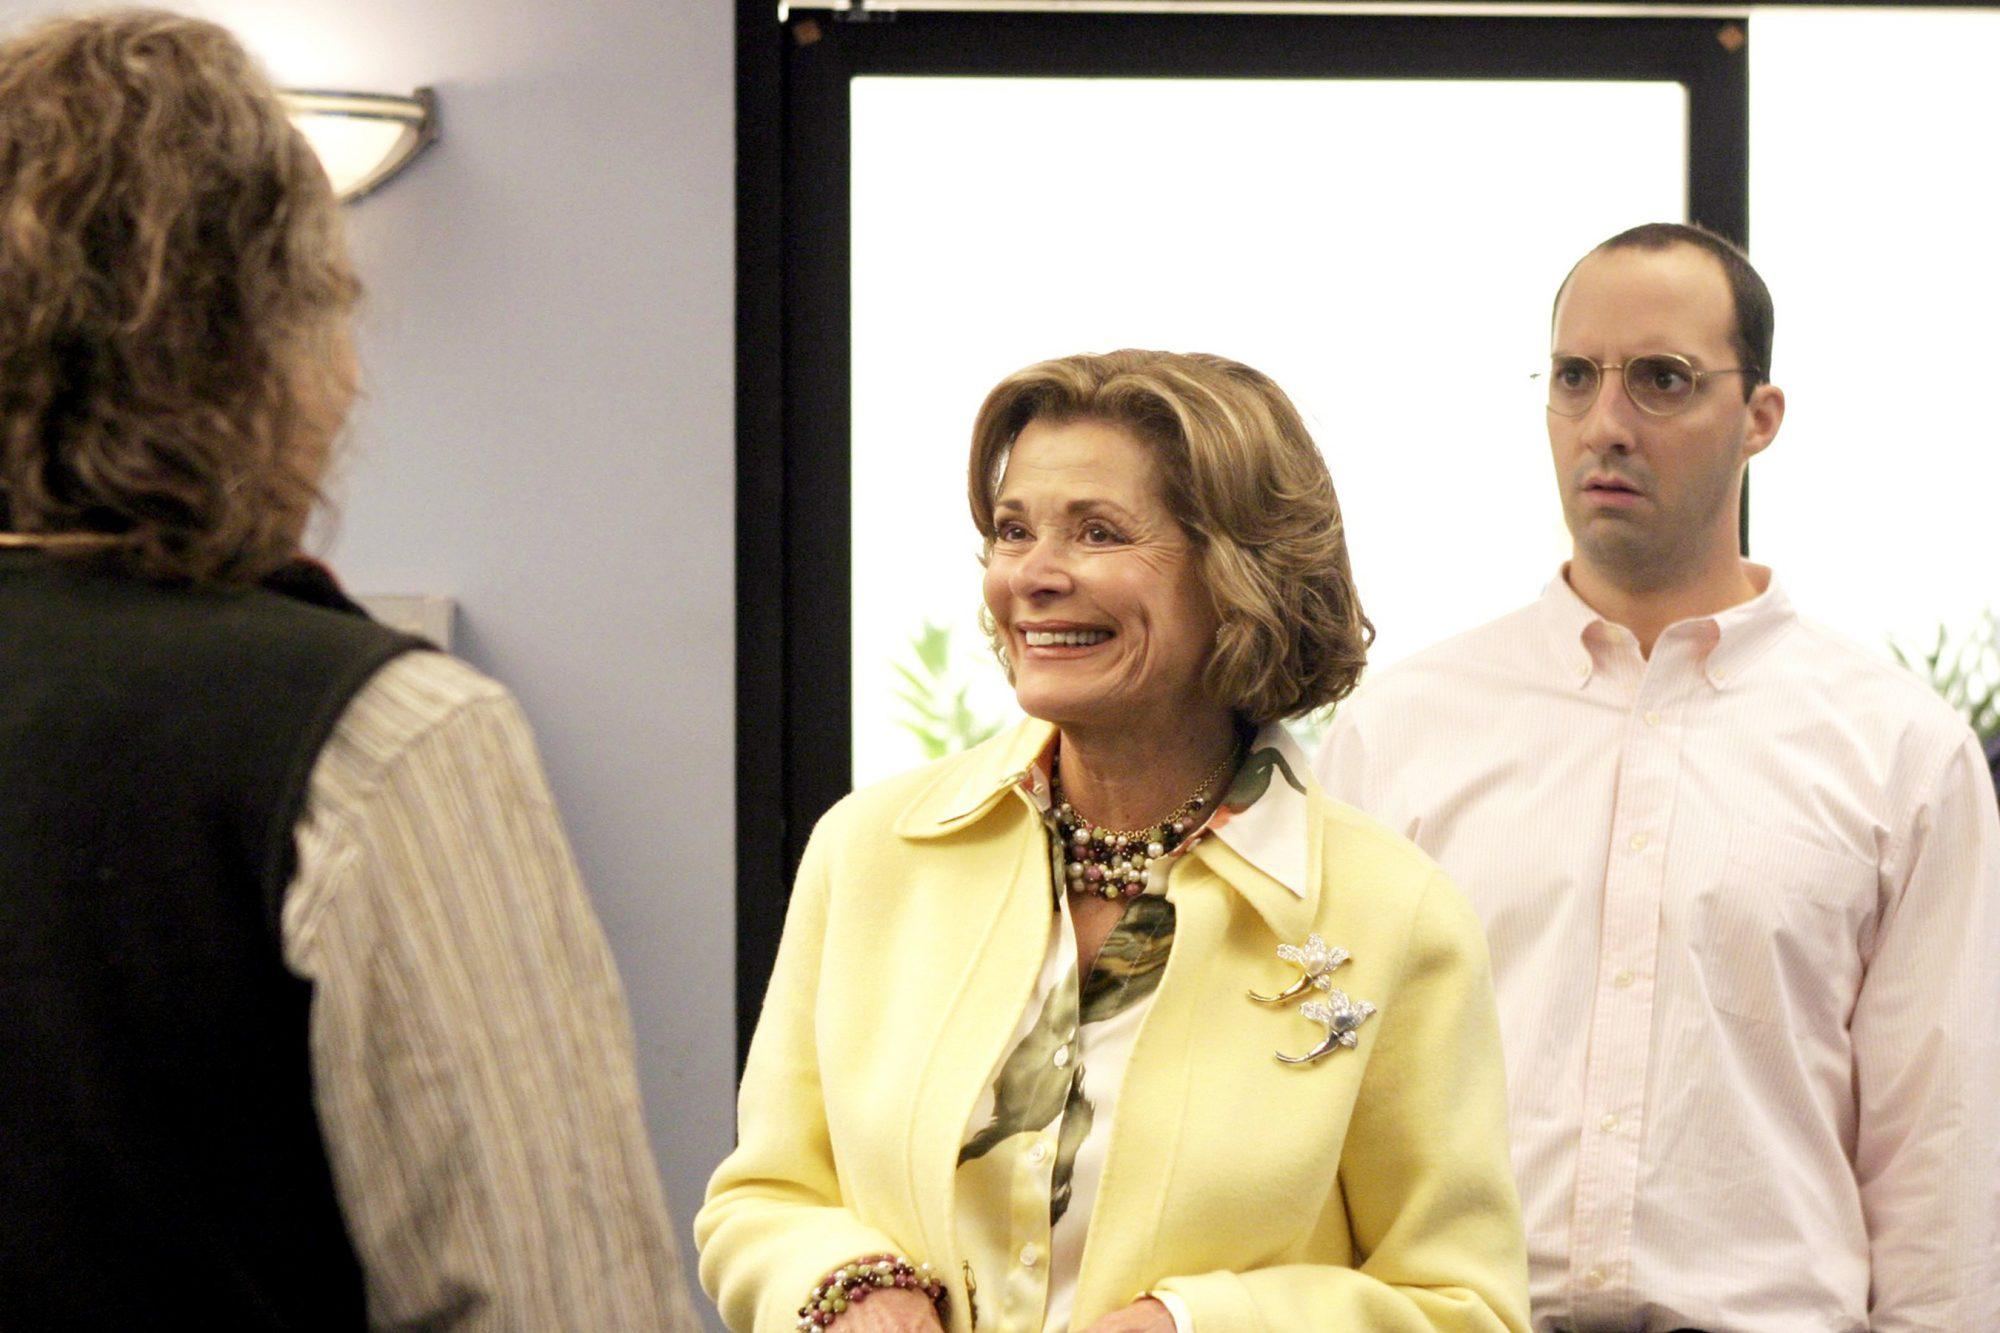 ARRESTED DEVELOPMENT, Jeffrey Tambor, Jessica Walter, Tony Hale, 'The One Where Michael Leaves', (Se